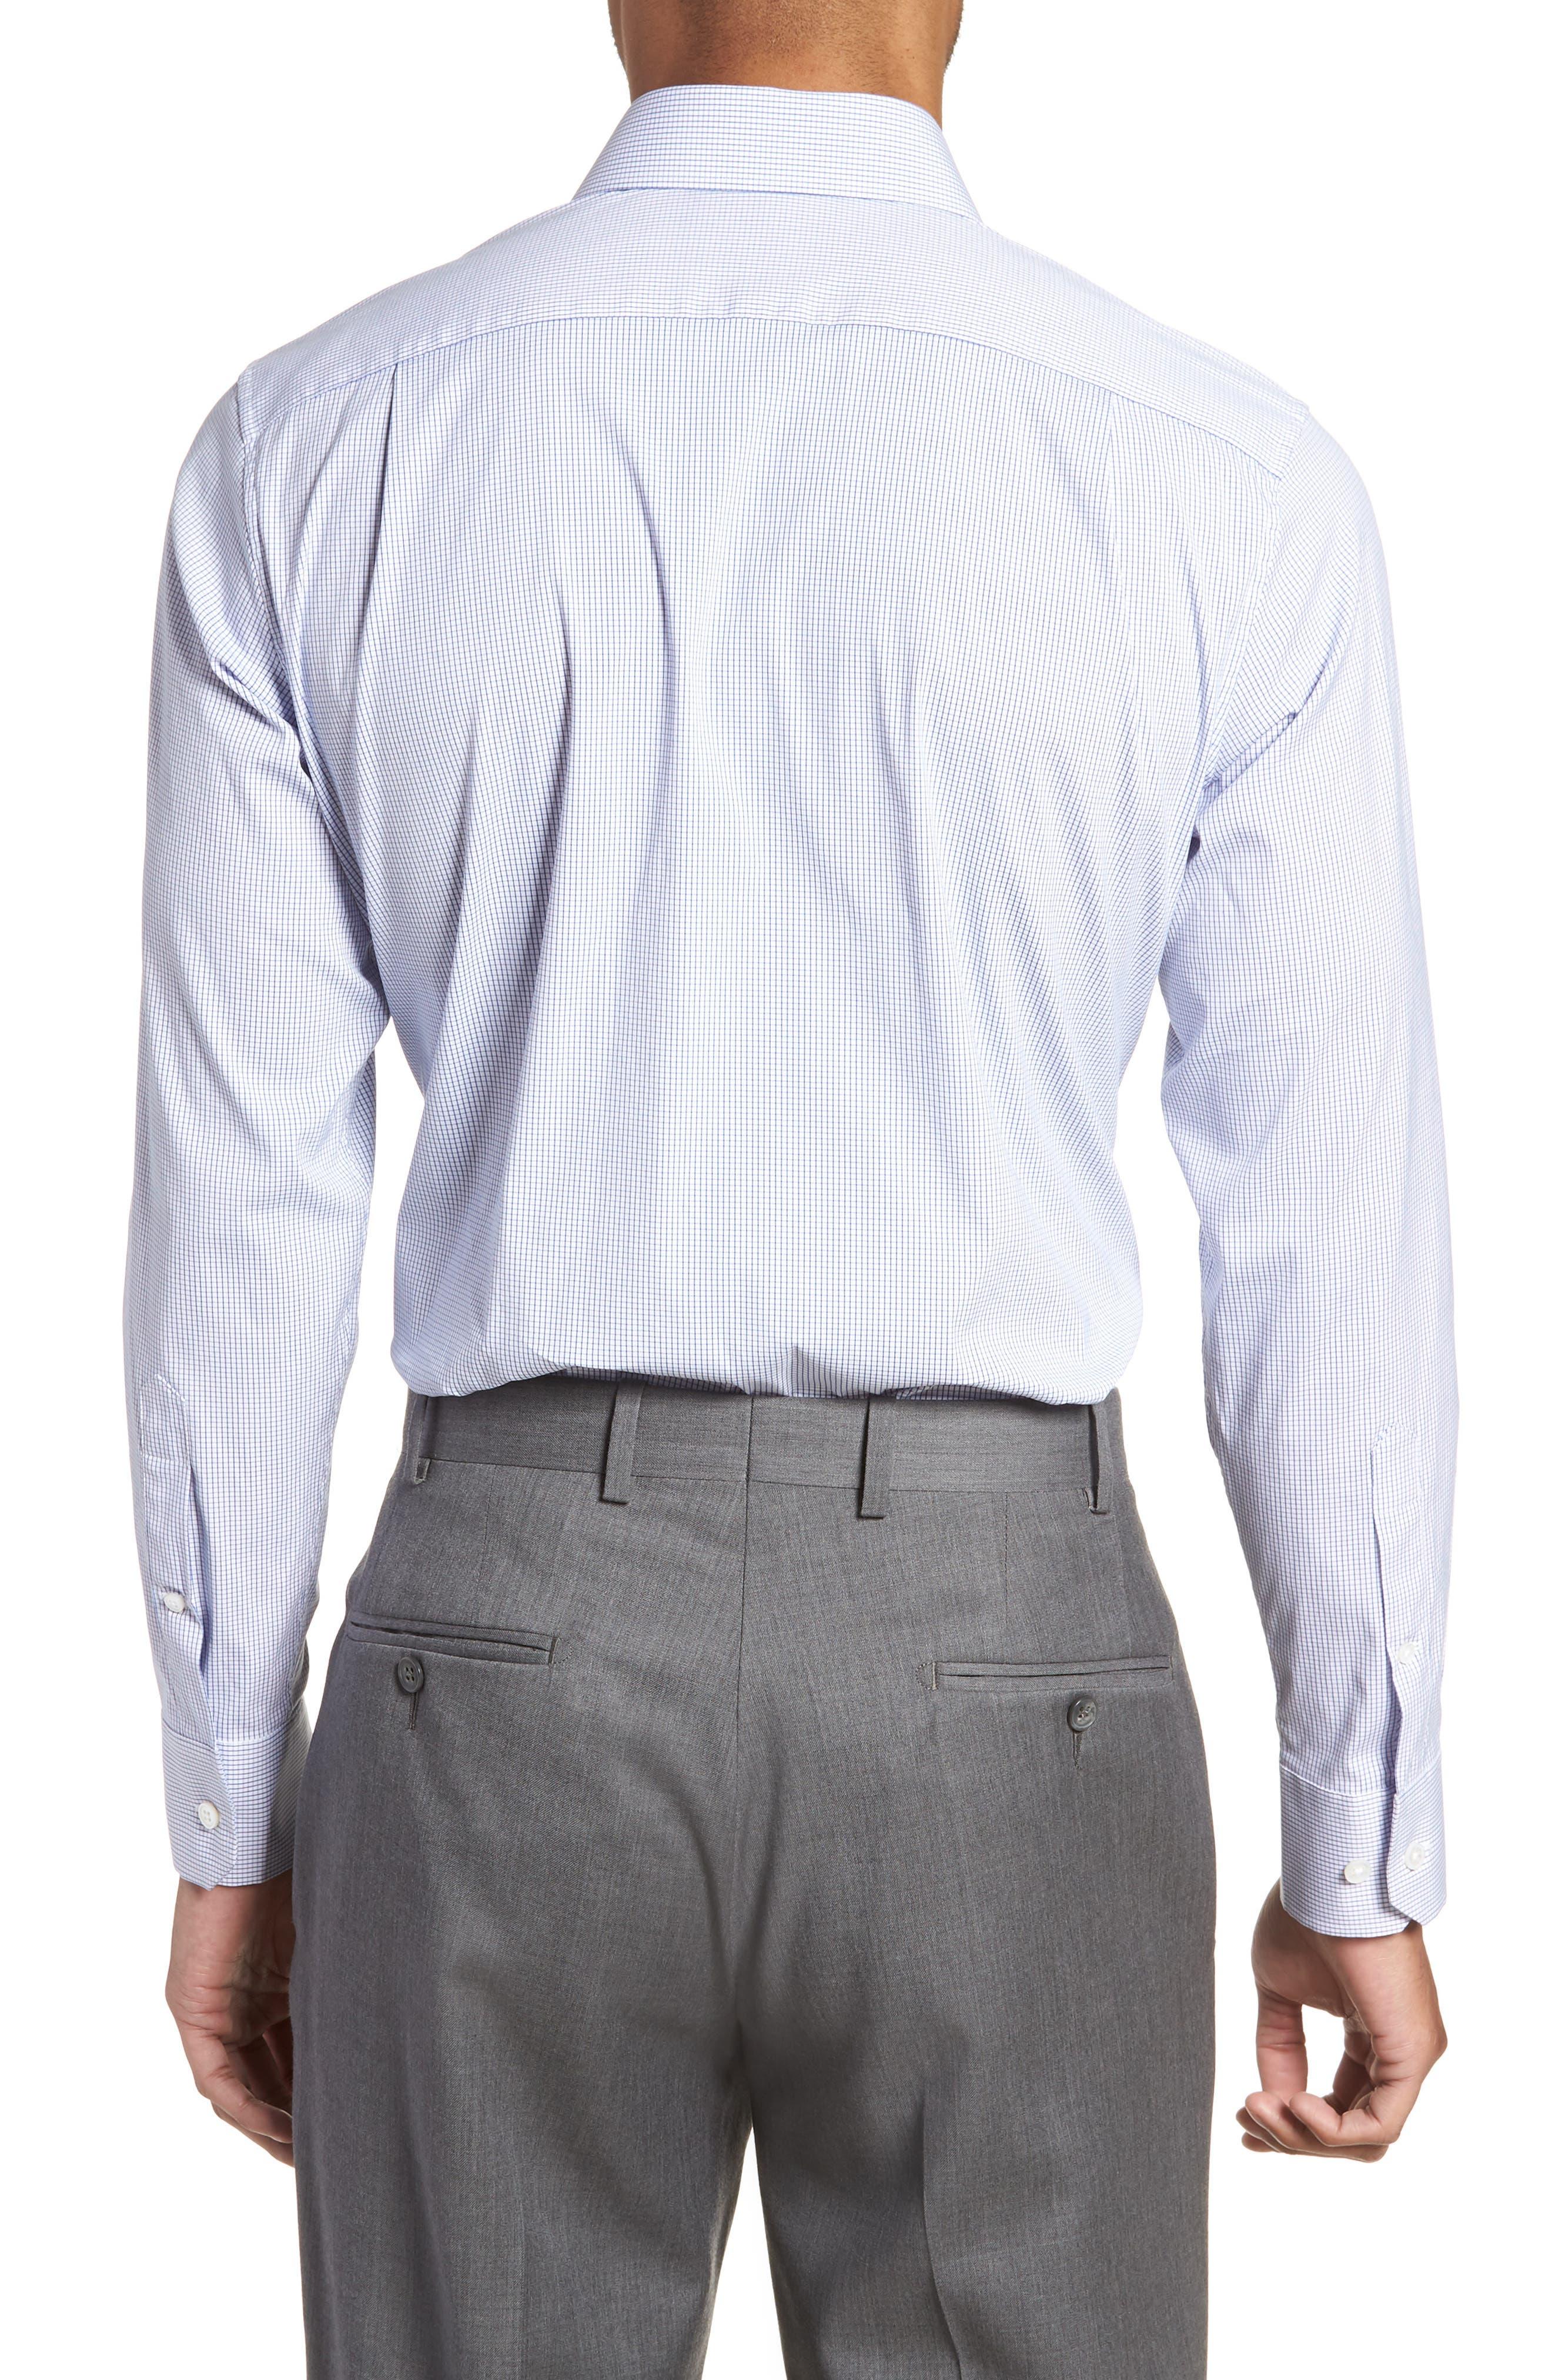 Jetsetter Slim Fit Stretch Check Dress Shirt,                             Alternate thumbnail 3, color,                             NAVY MINI CHECK